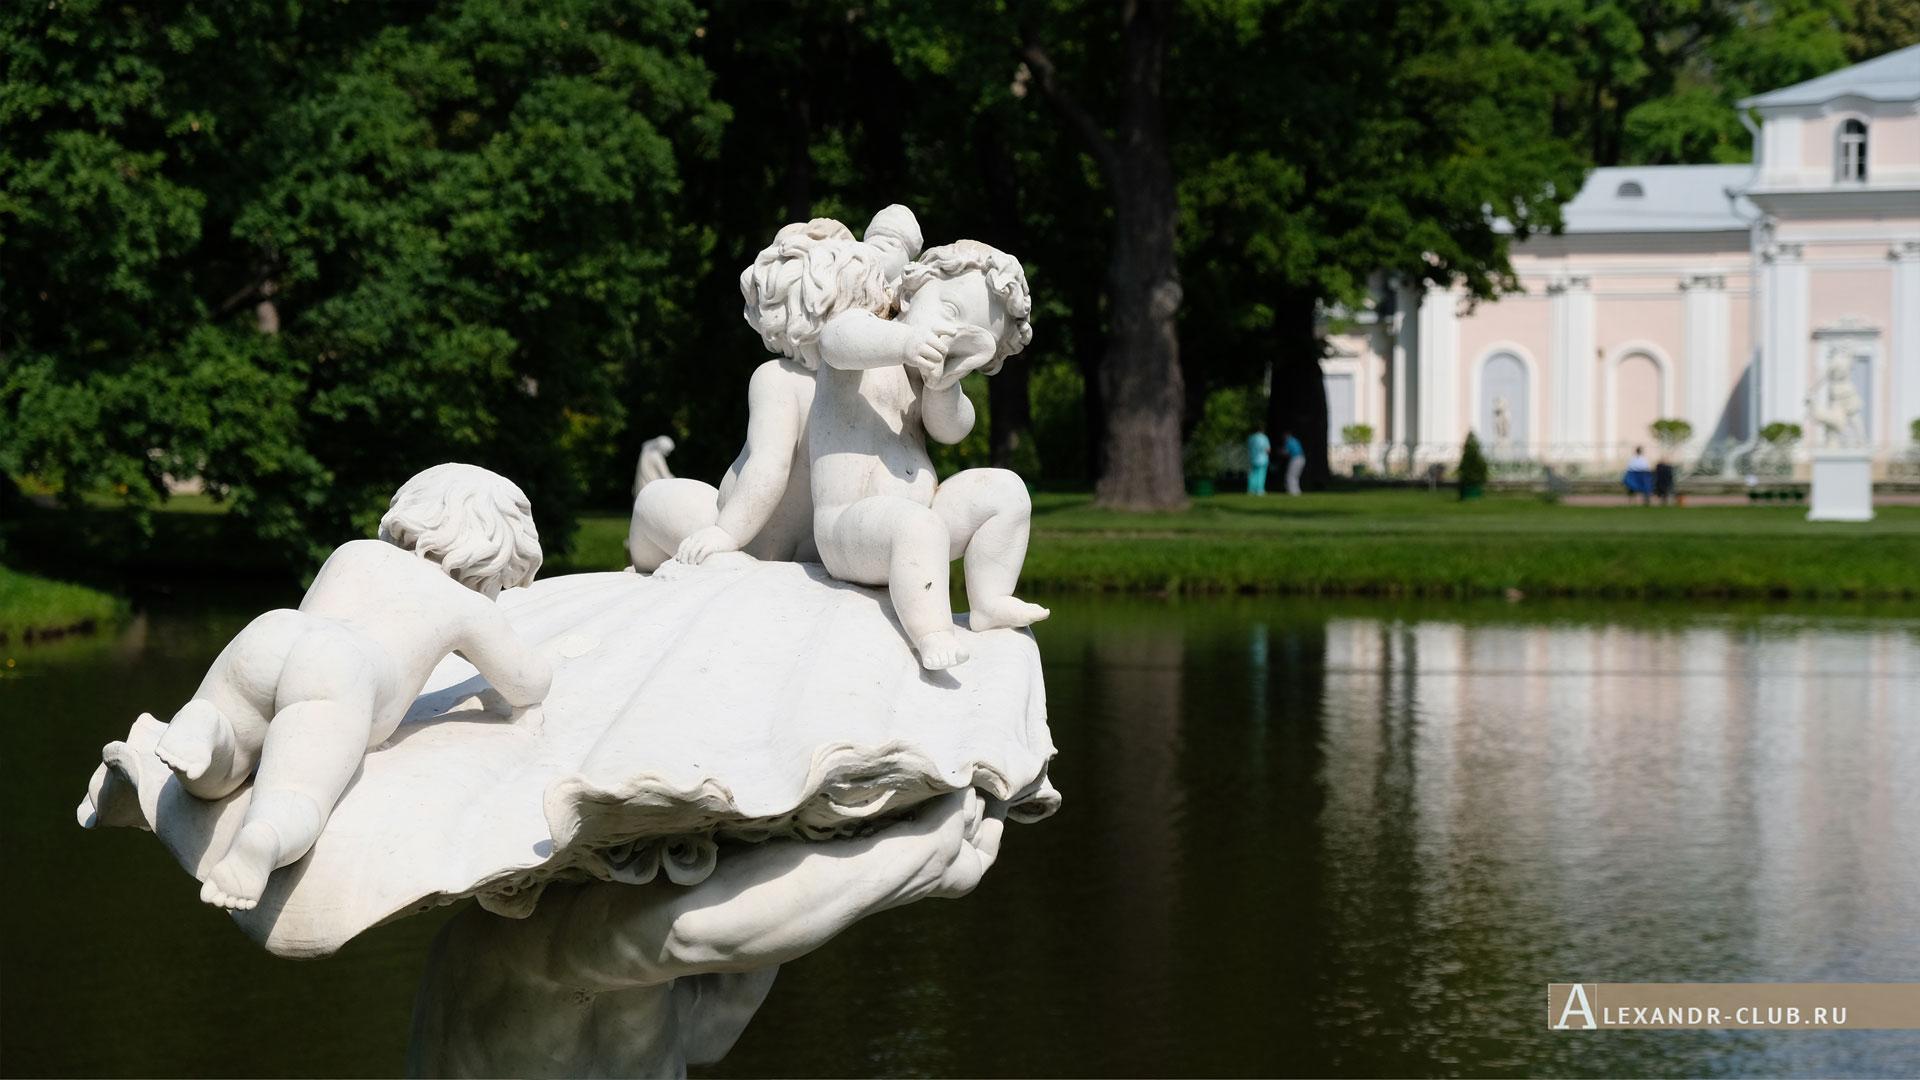 Ораниенбаум, лето, Китайский пруд, Китайский дворец